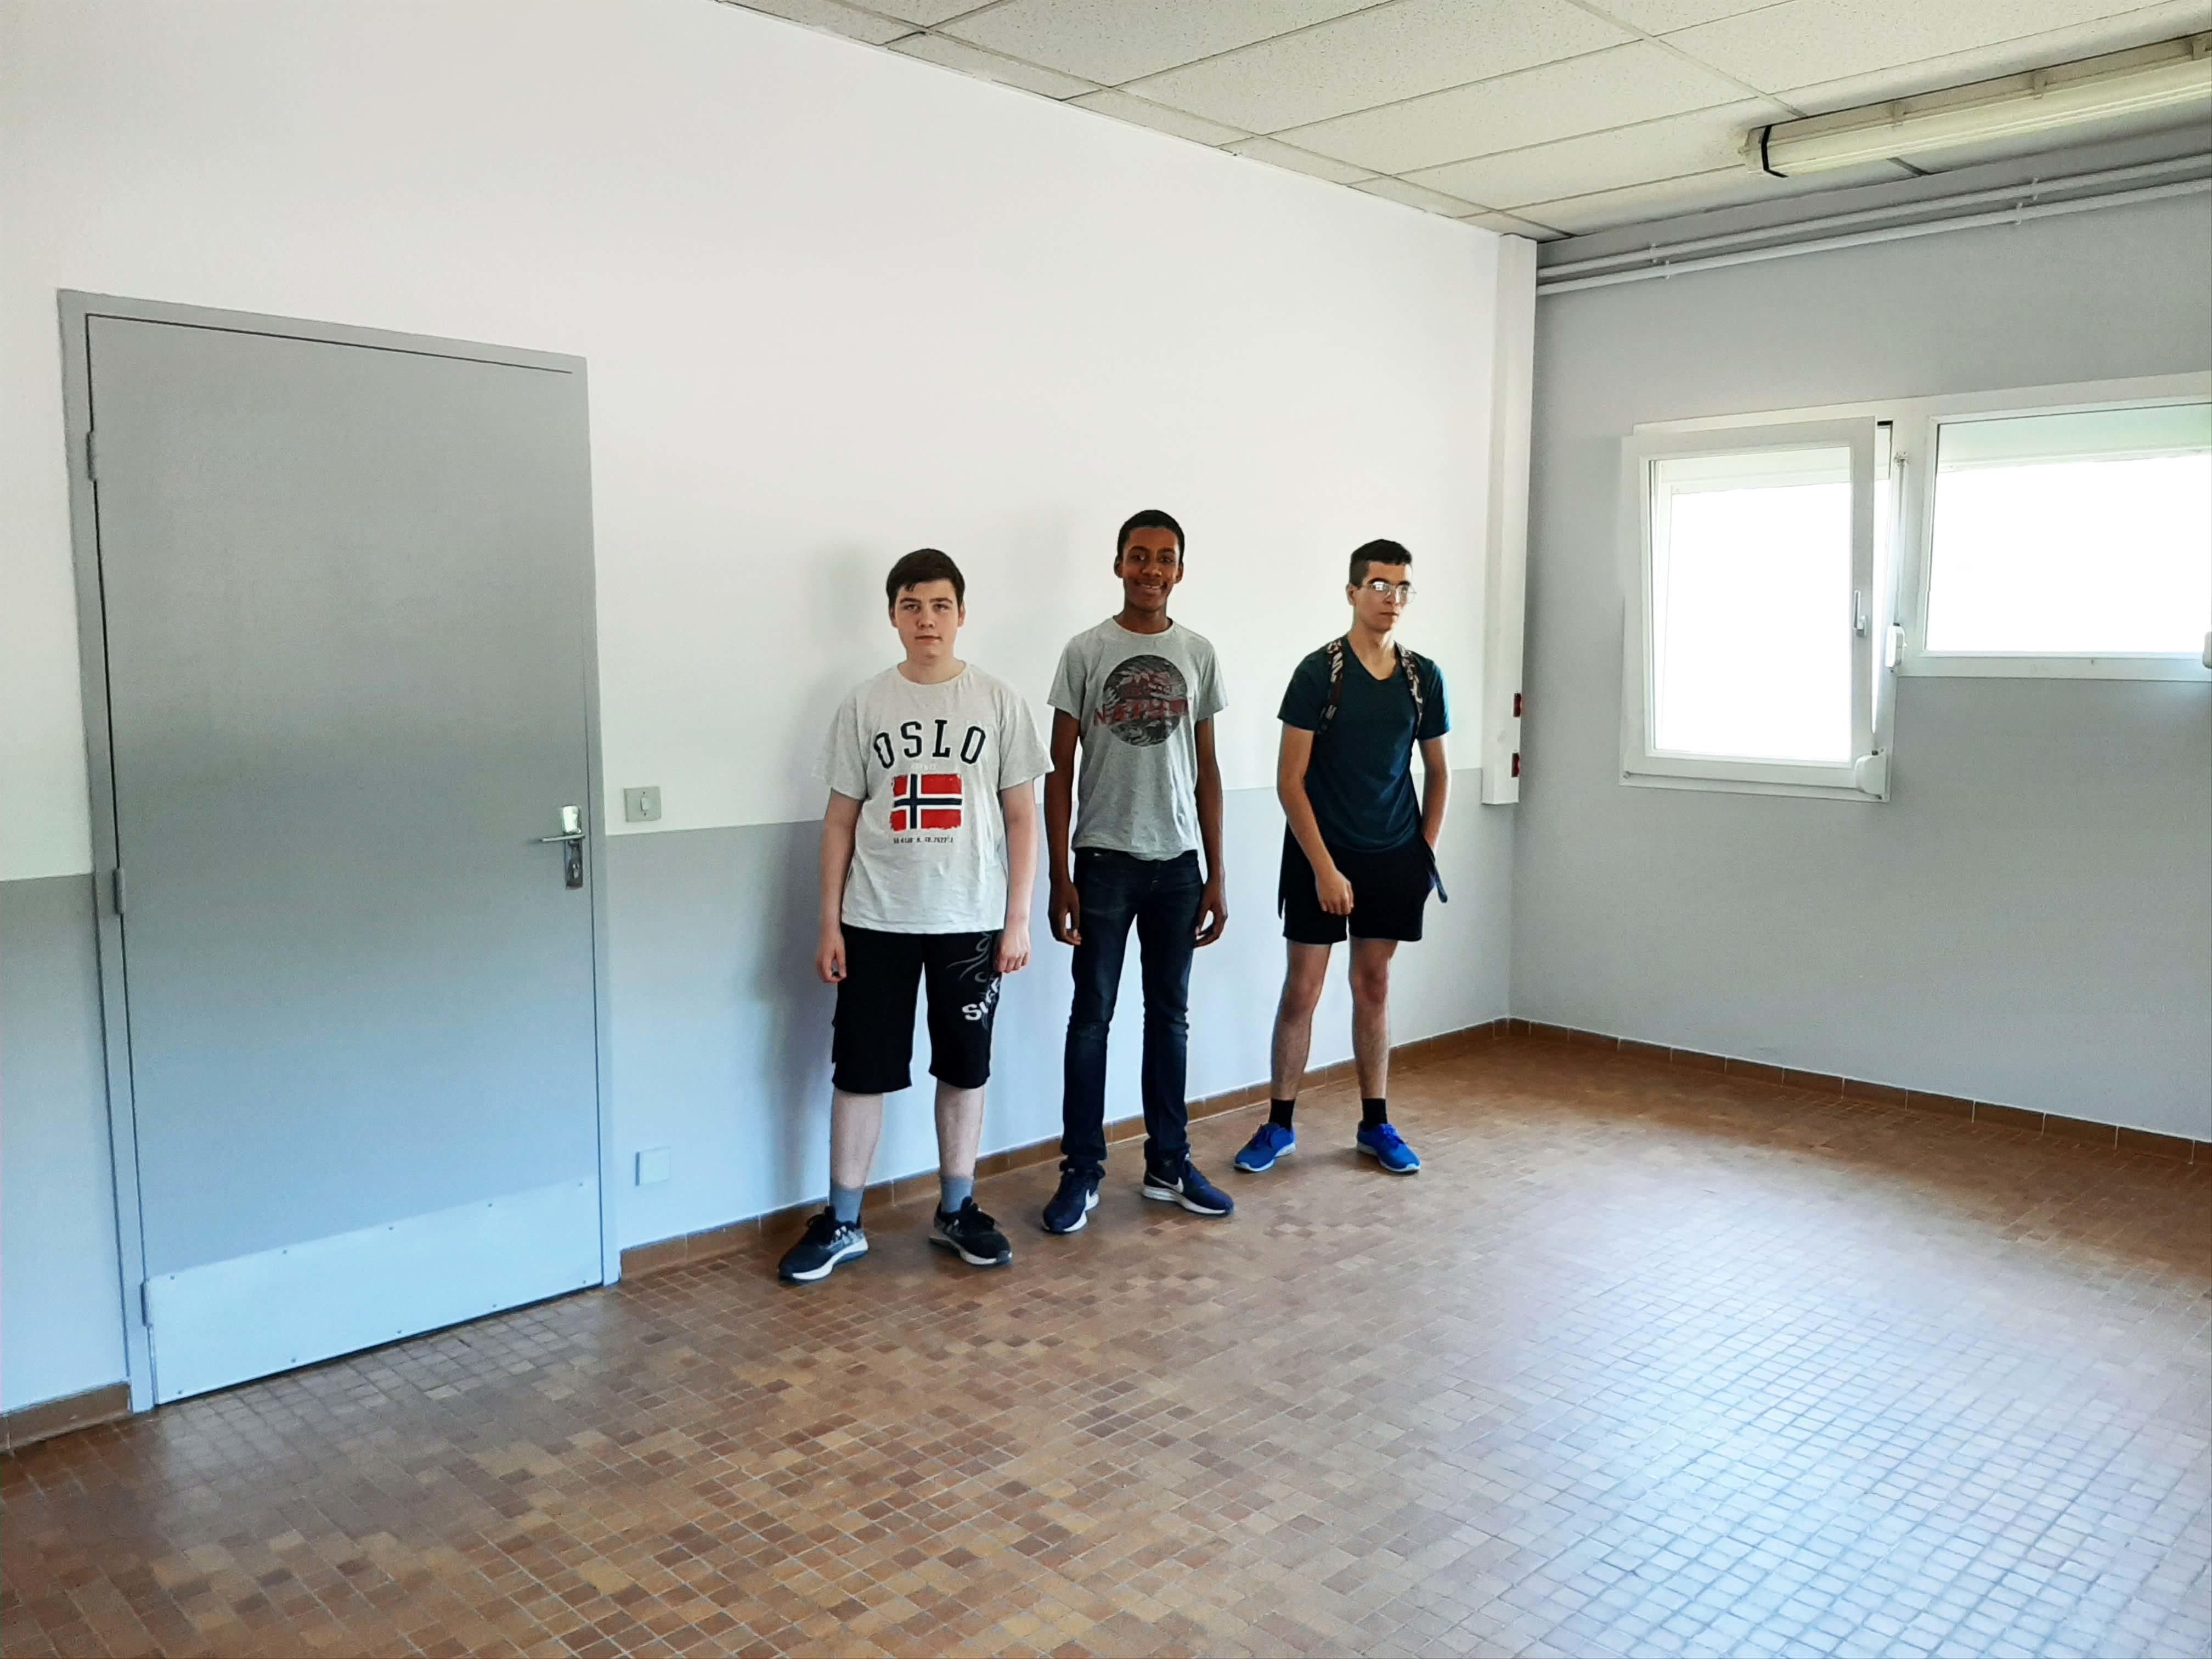 Élèves du groupe HABITAT, dans l'ordre Mathéo, Benjamin, Rafaël.